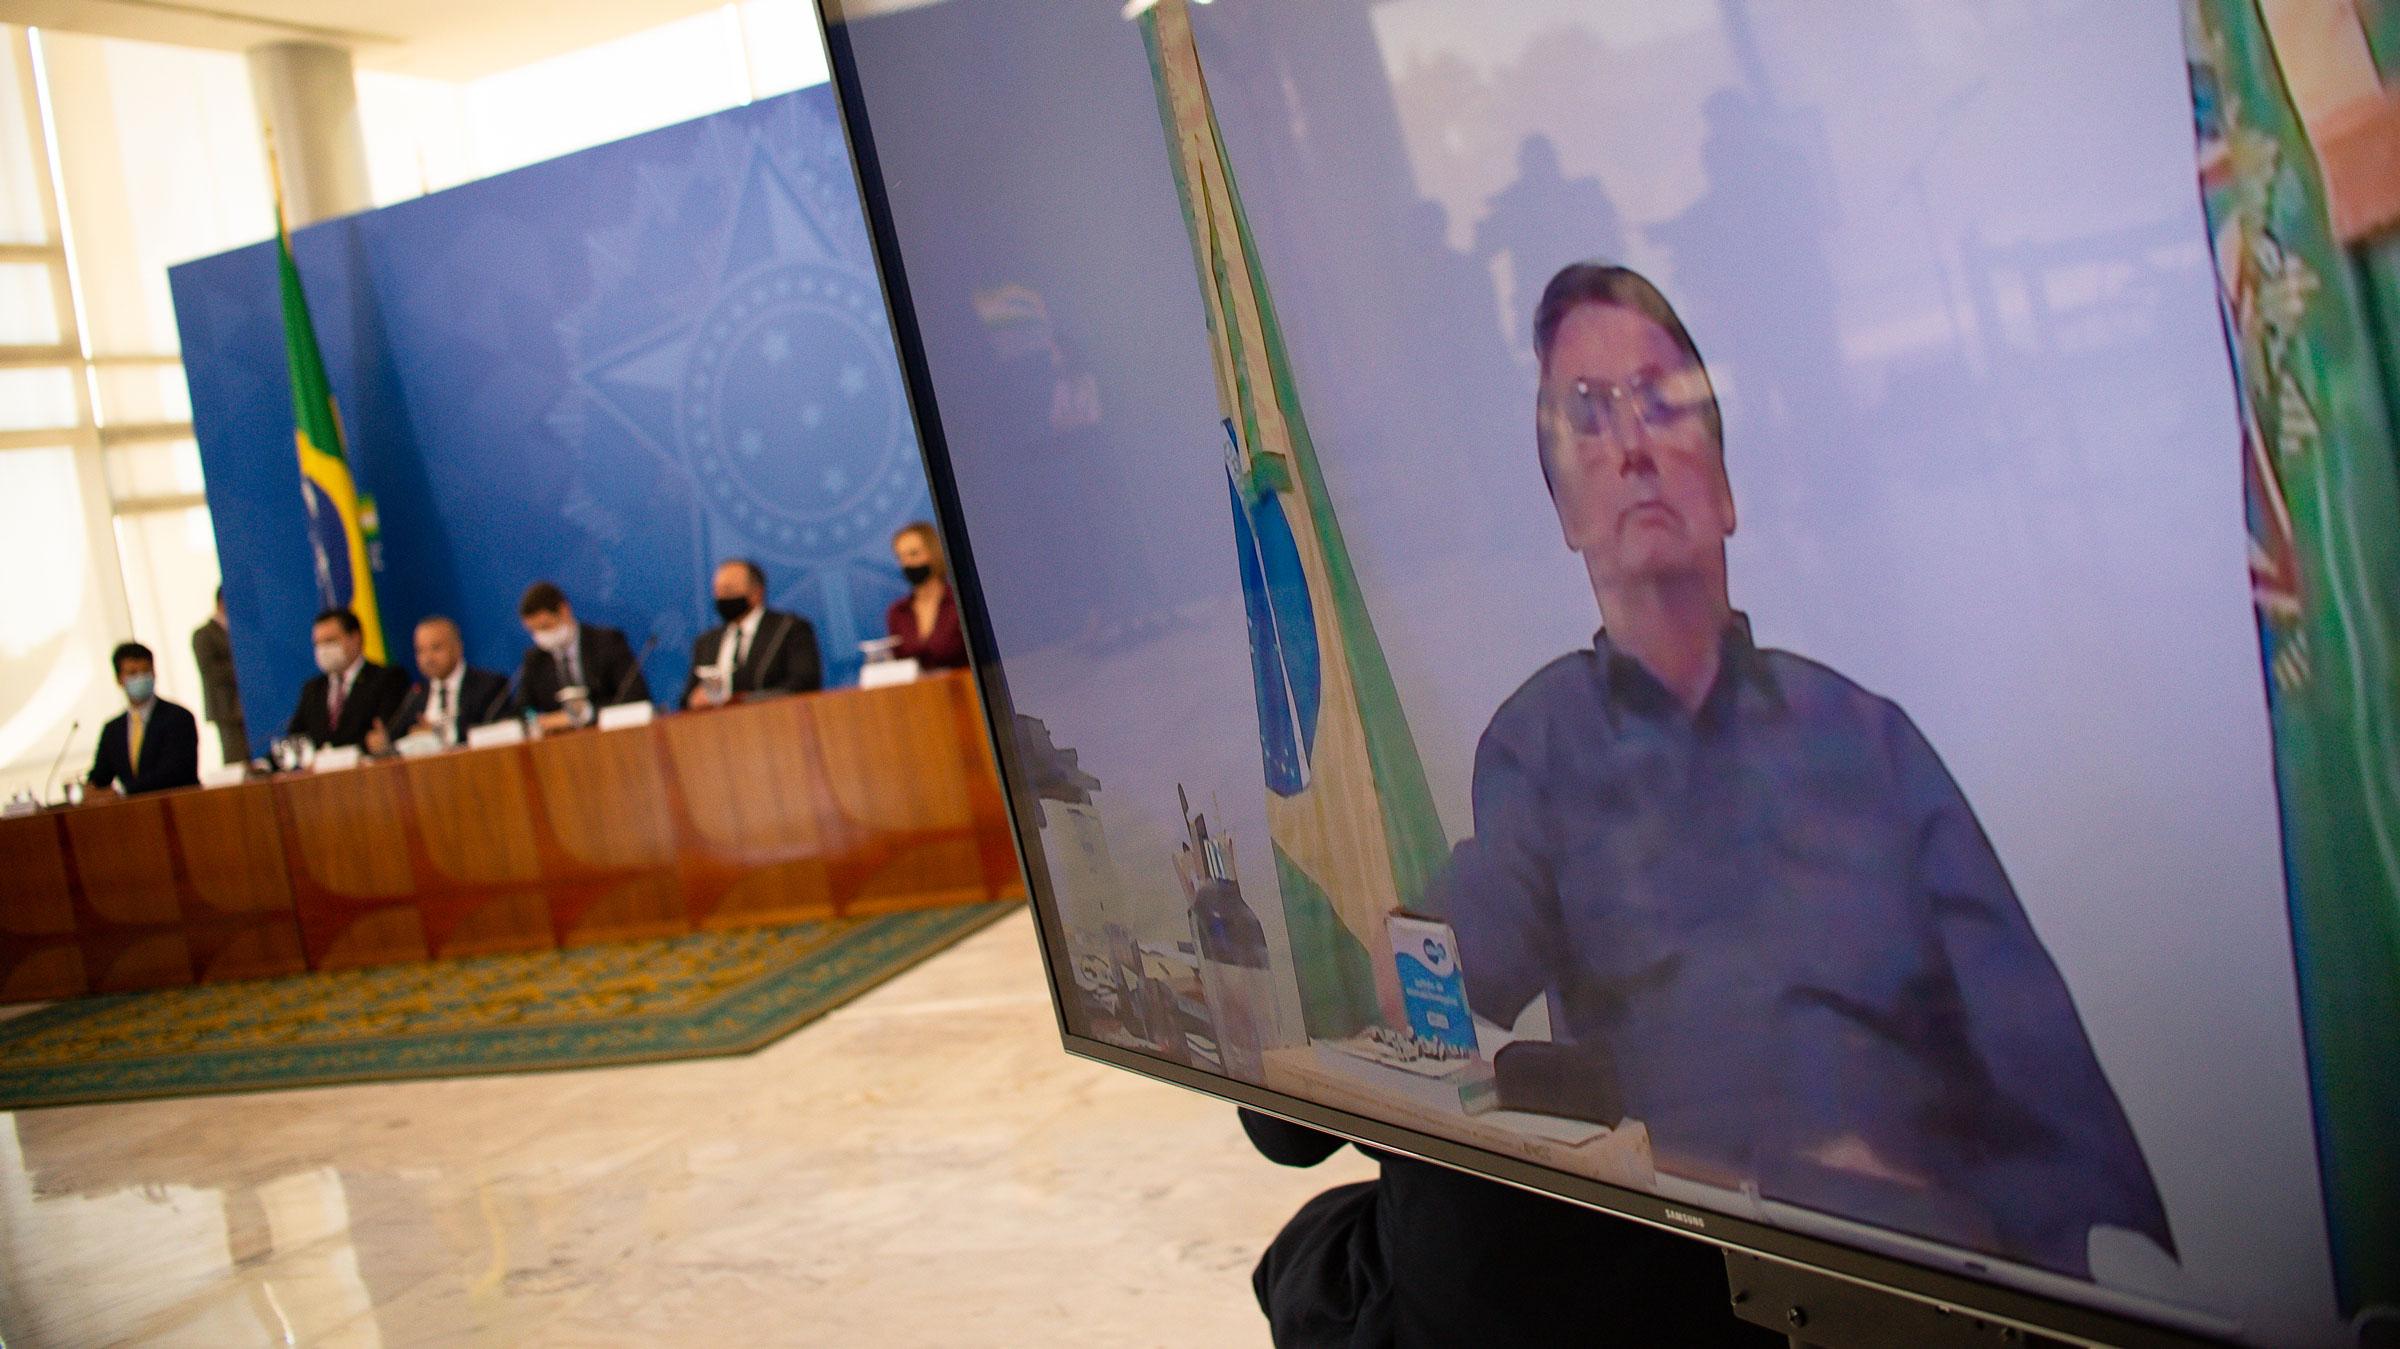 Brazilian President Jair Bolsonaro participates in a ceremony via video conference on Wednesday.